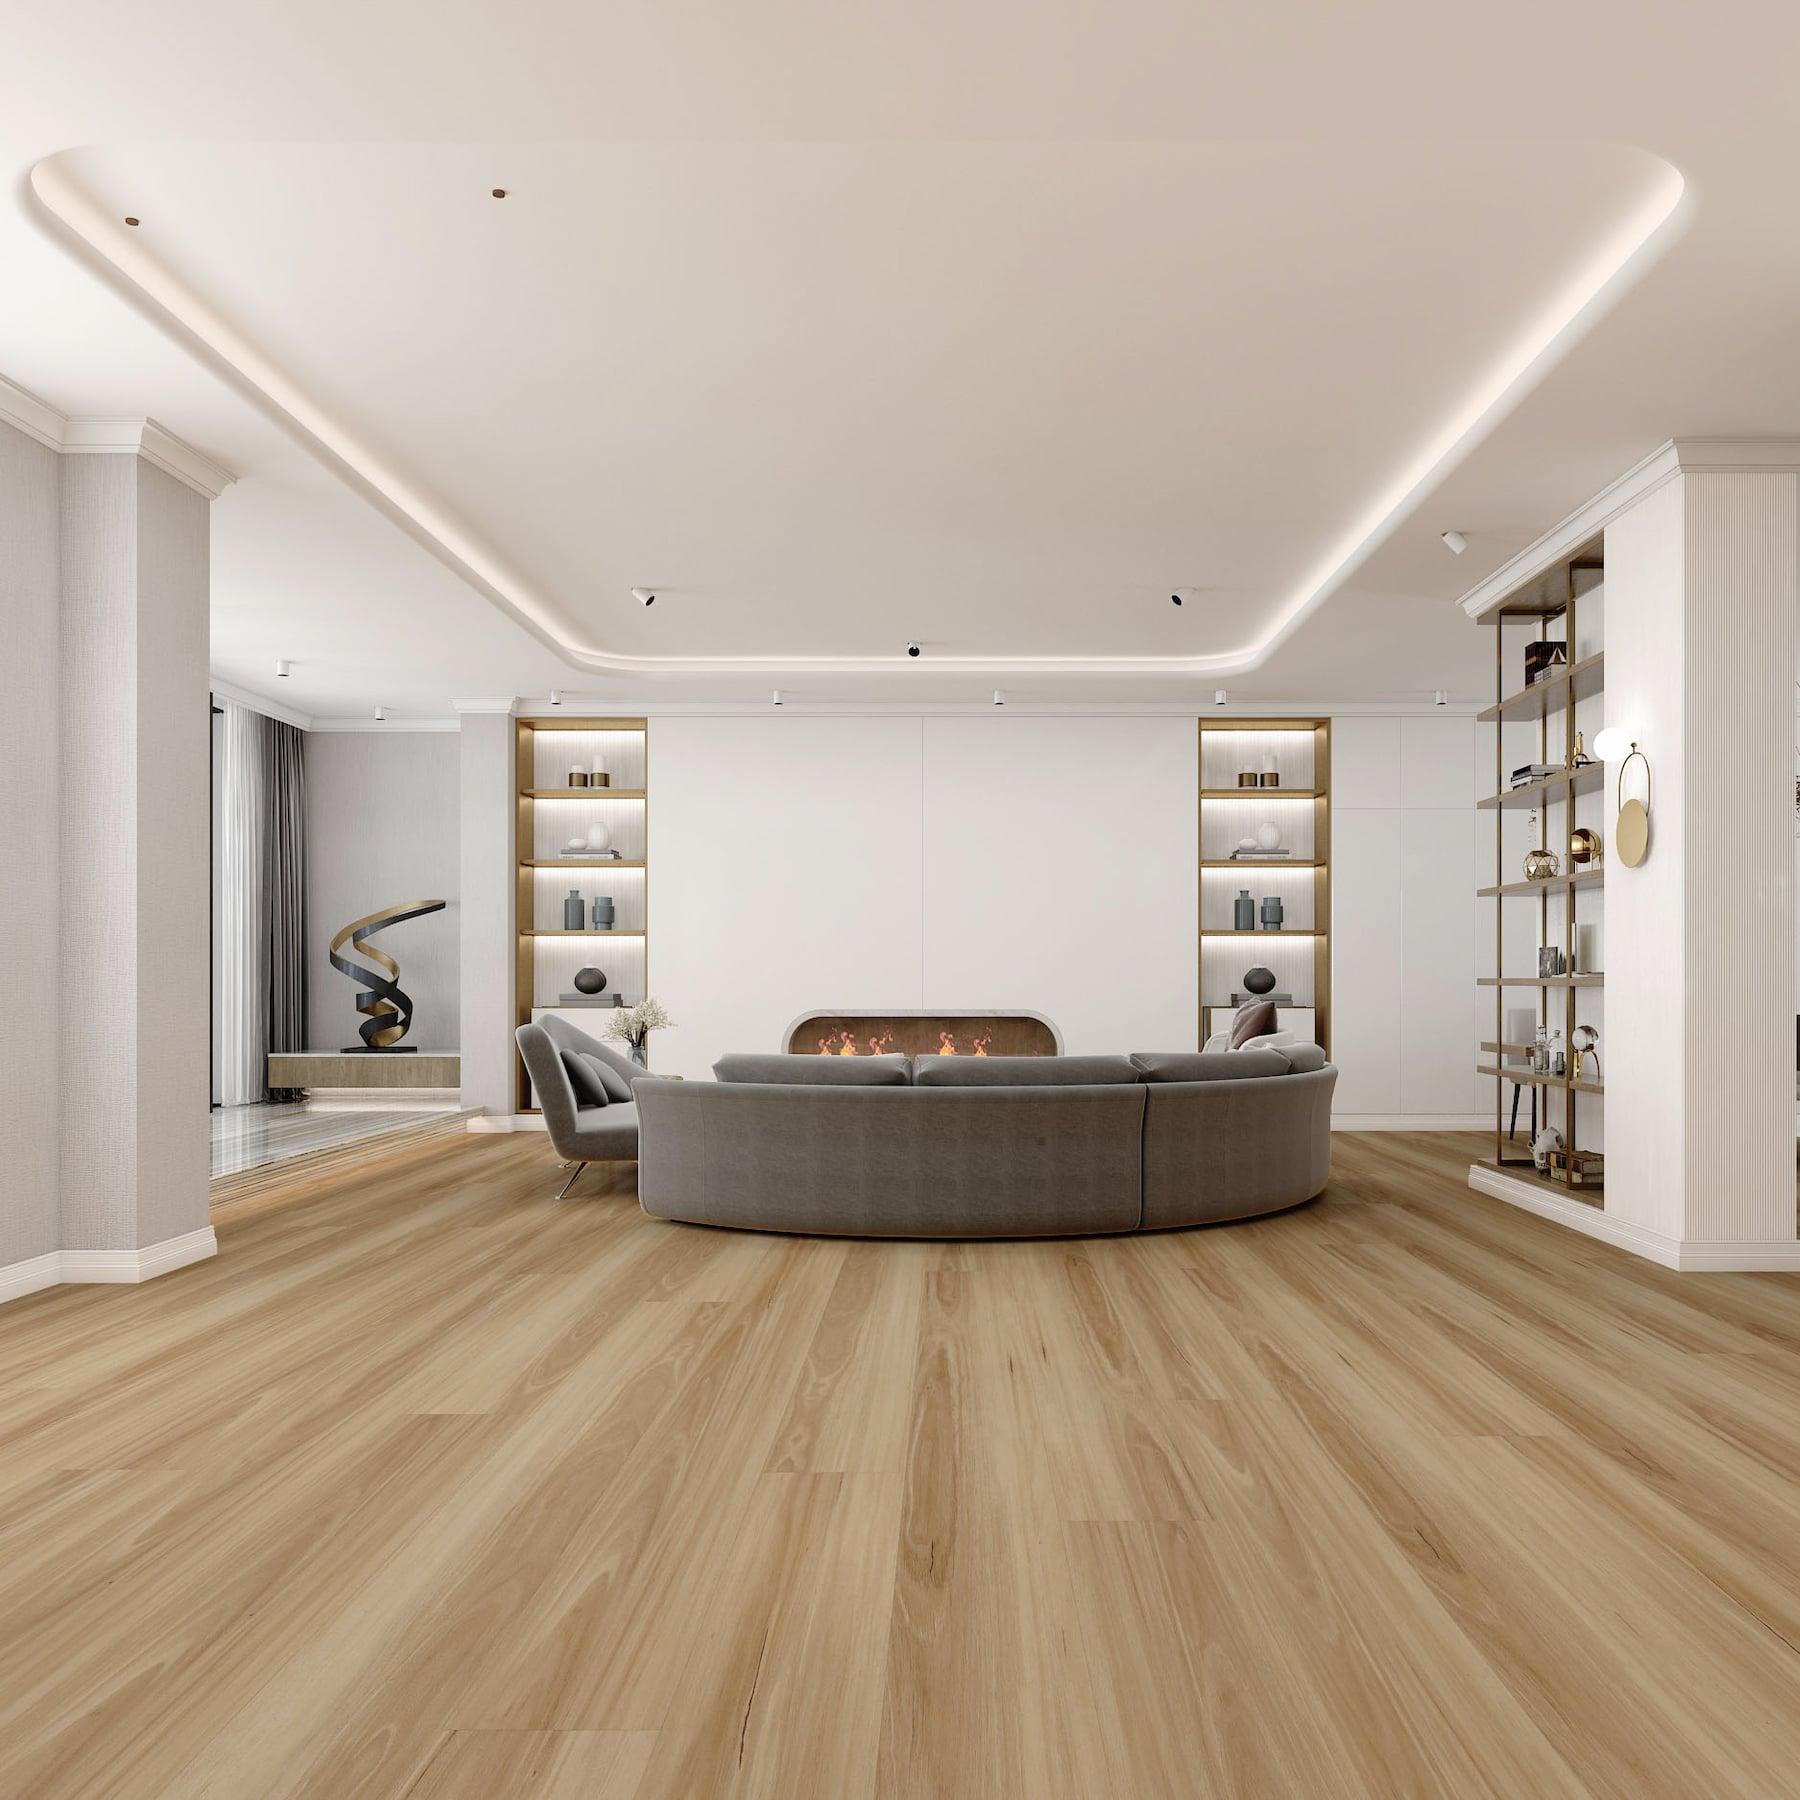 Topdeck Storm Luxury Hybrid Flooring New England Blackbutt - The Flooring Guys